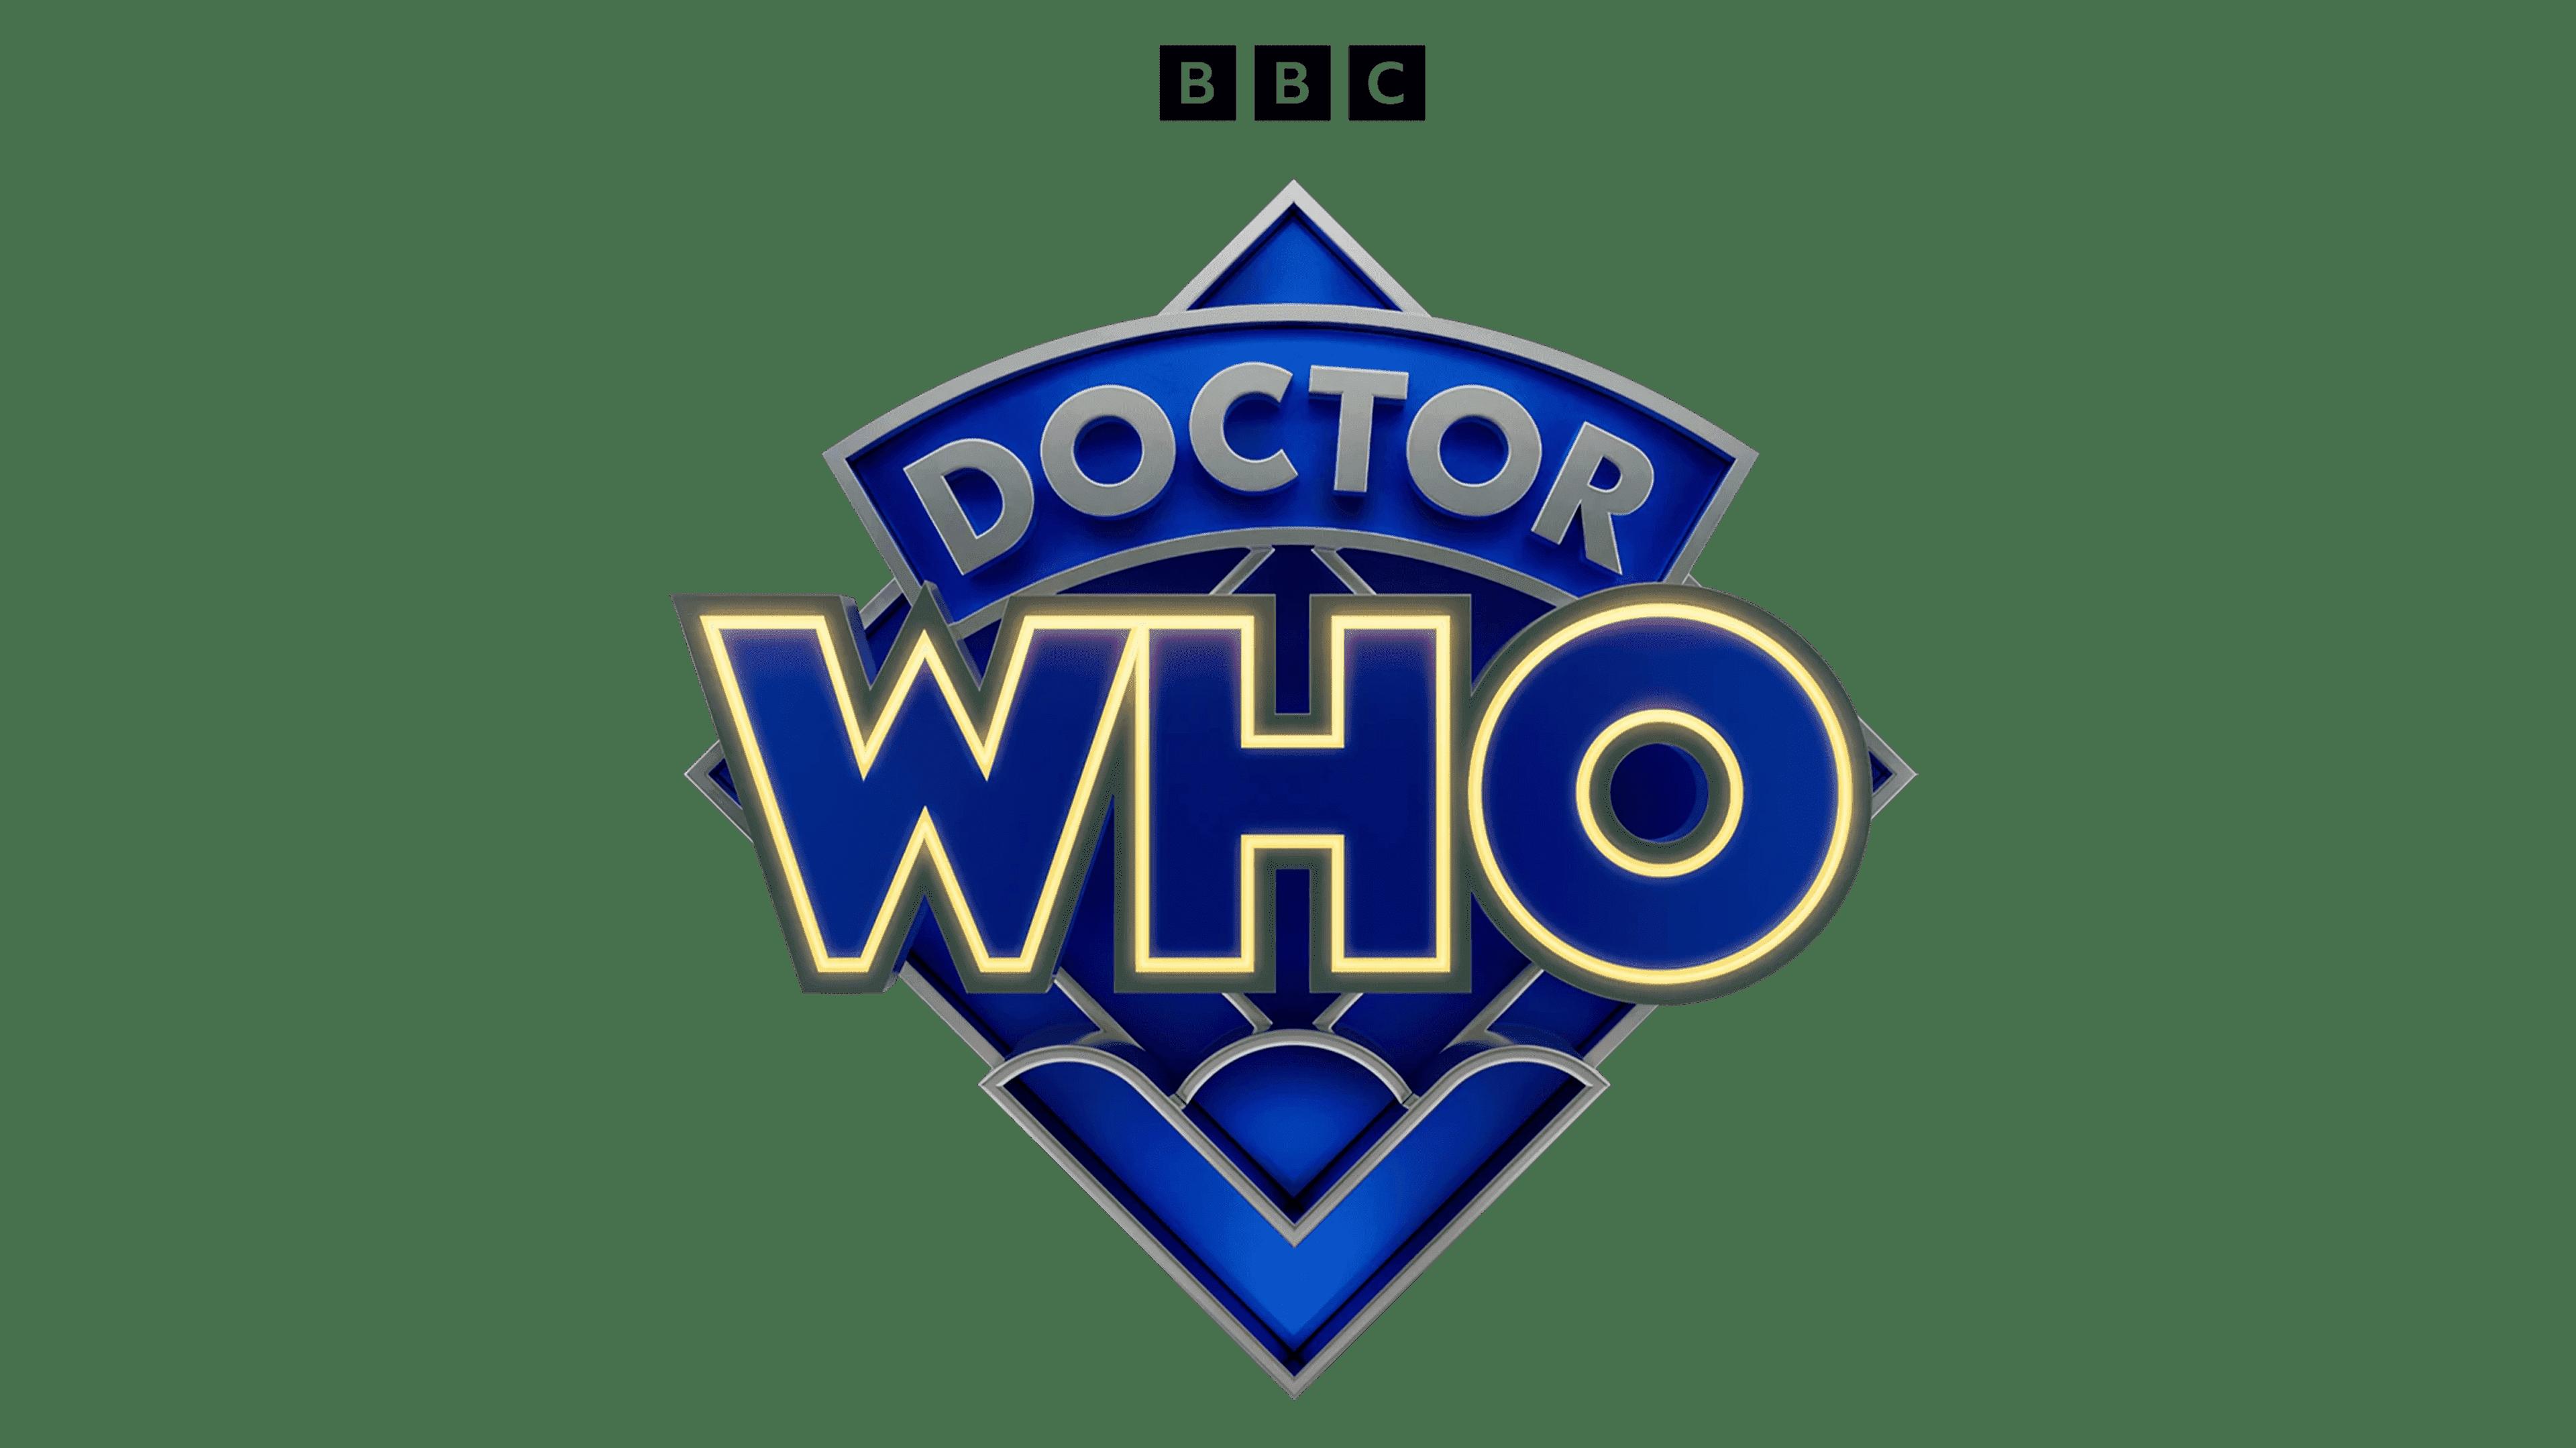 https://1000logos.net/wp-content/uploads/2019/04/Doctor-Who-Logo.png